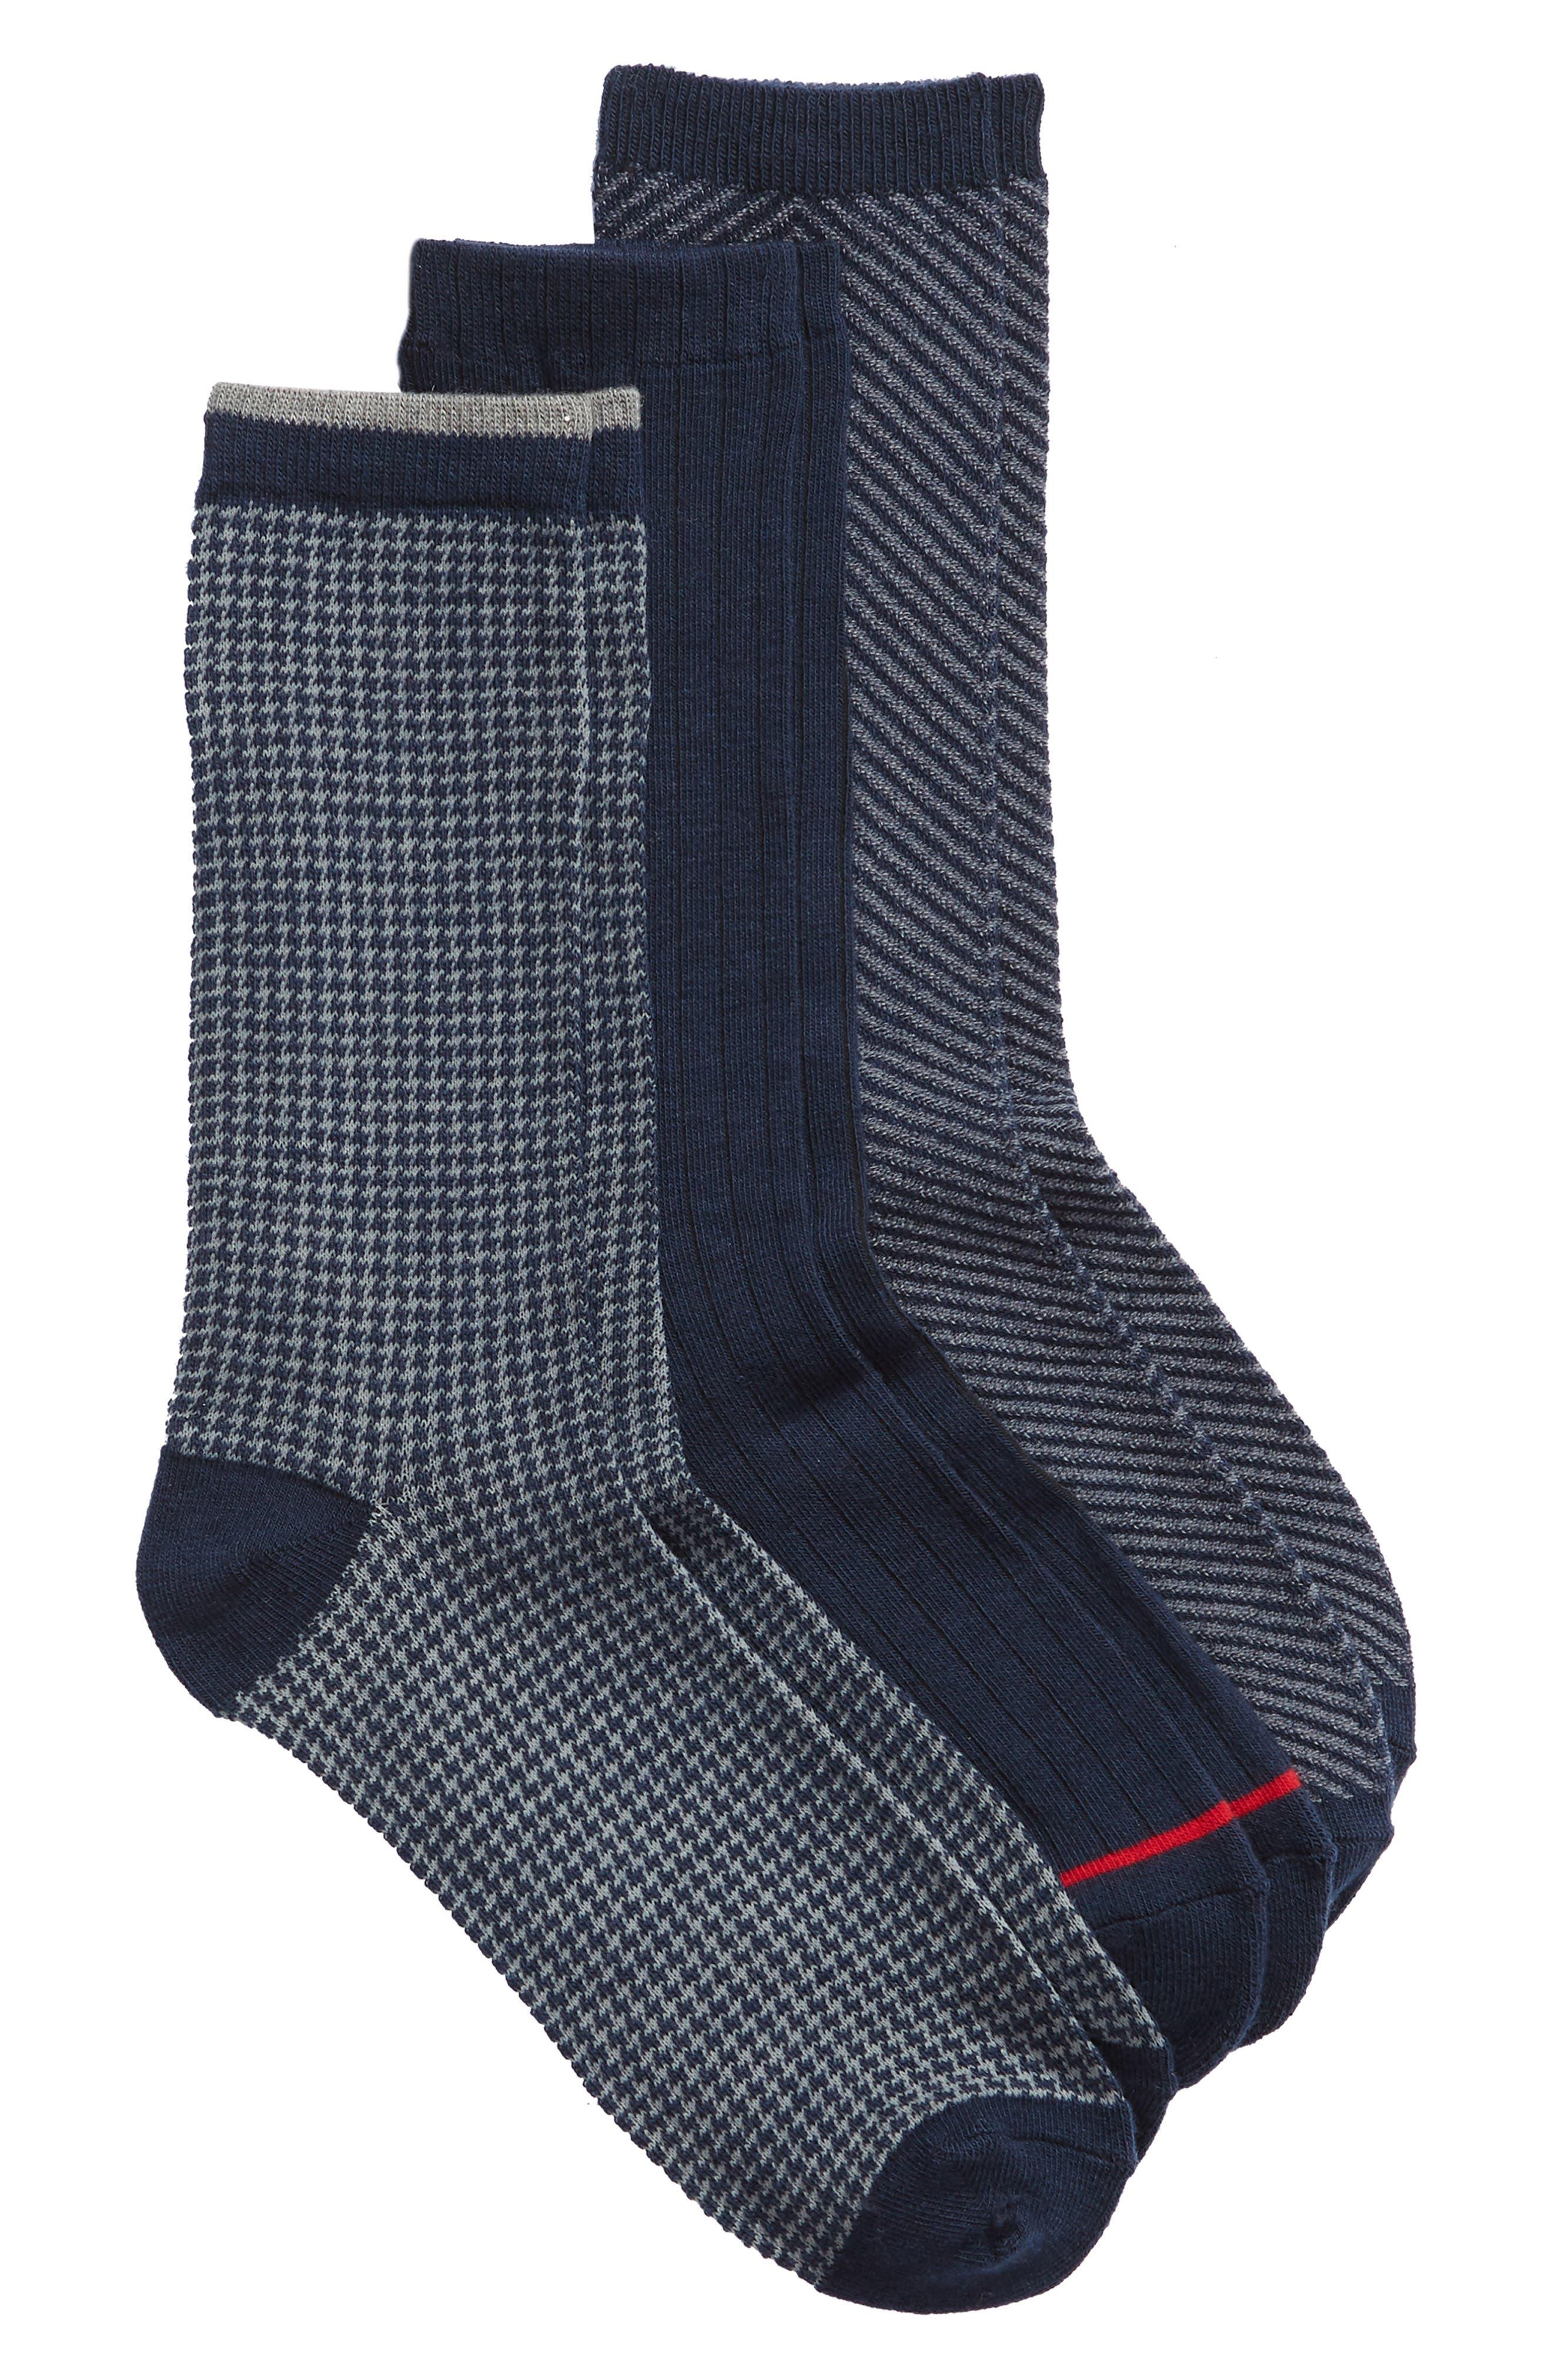 Dominic 3-Pack Crew Socks,                             Main thumbnail 1, color,                             NAVY MULTI